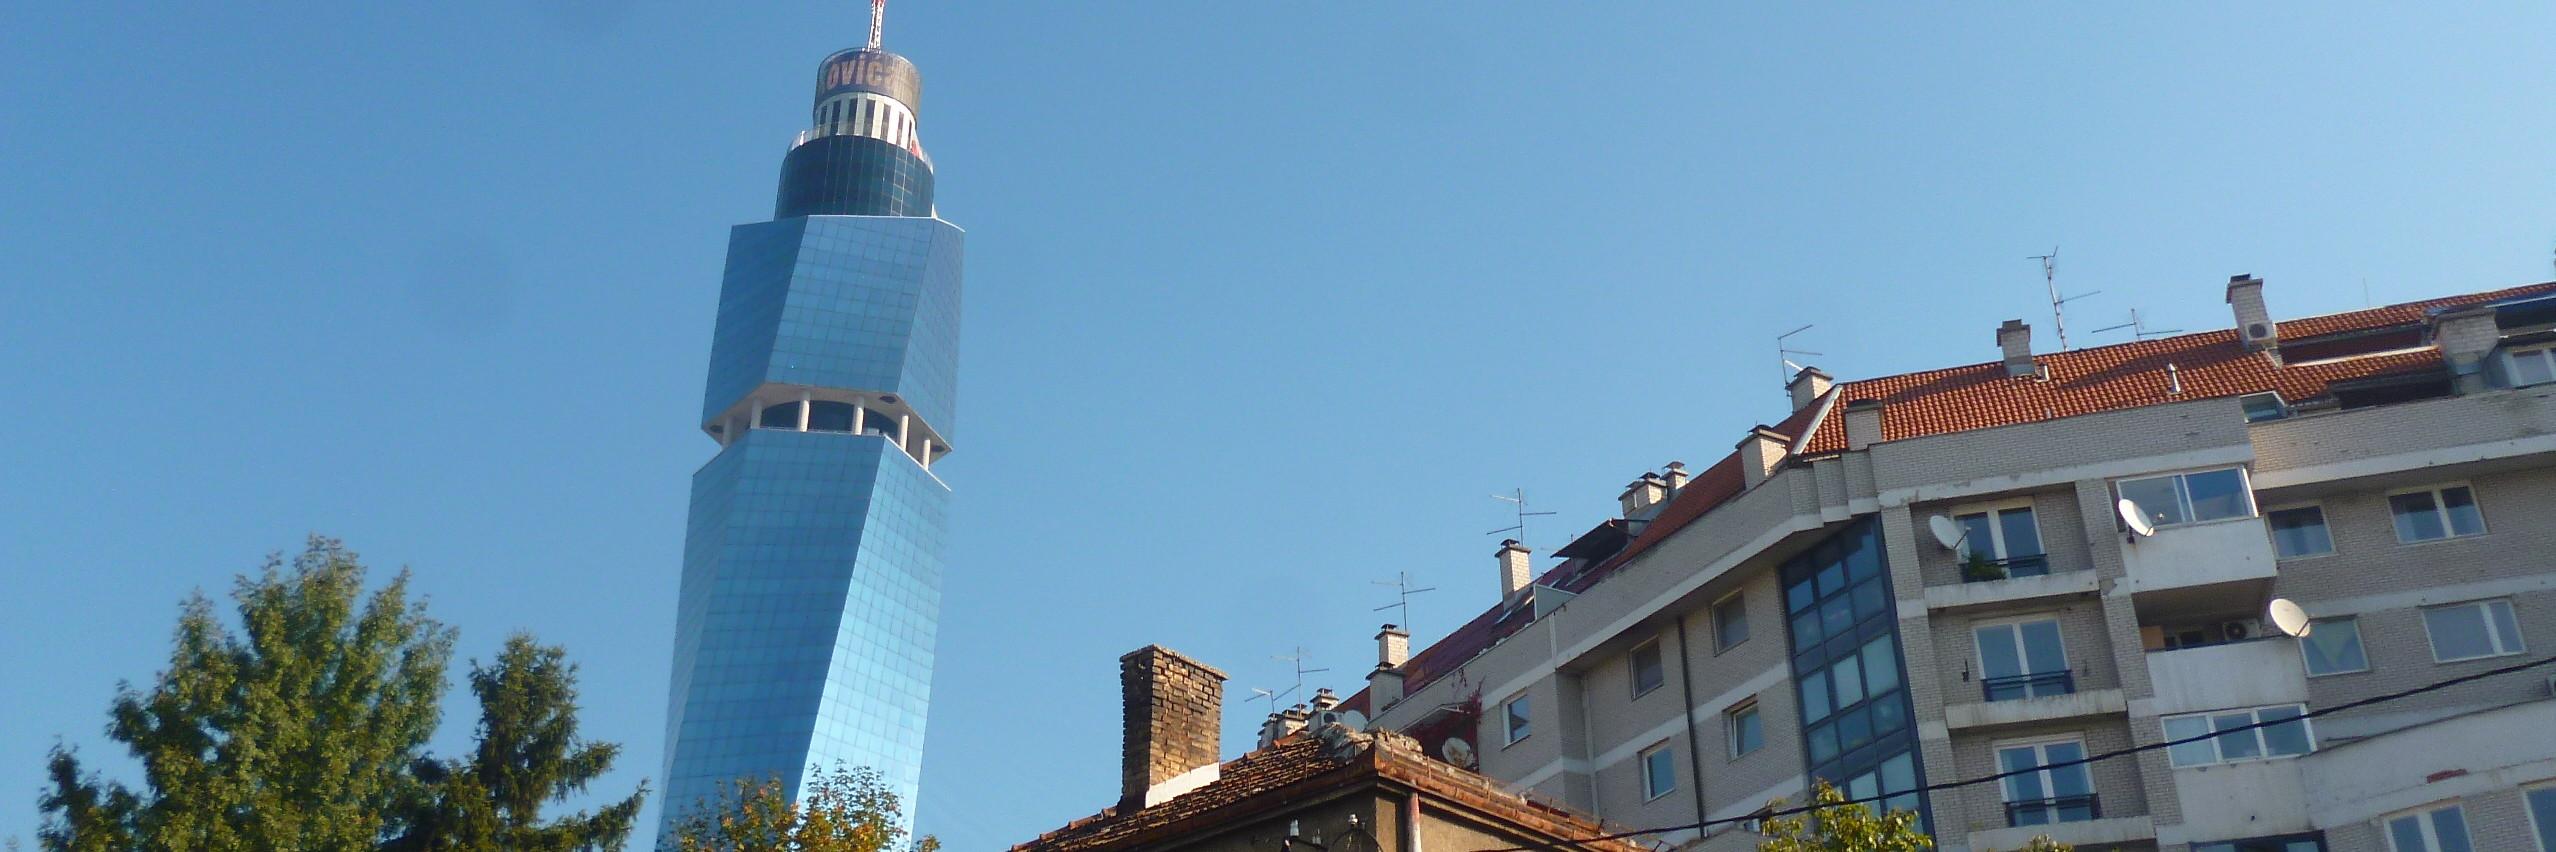 Небоскрёб Avaz Twist Tower